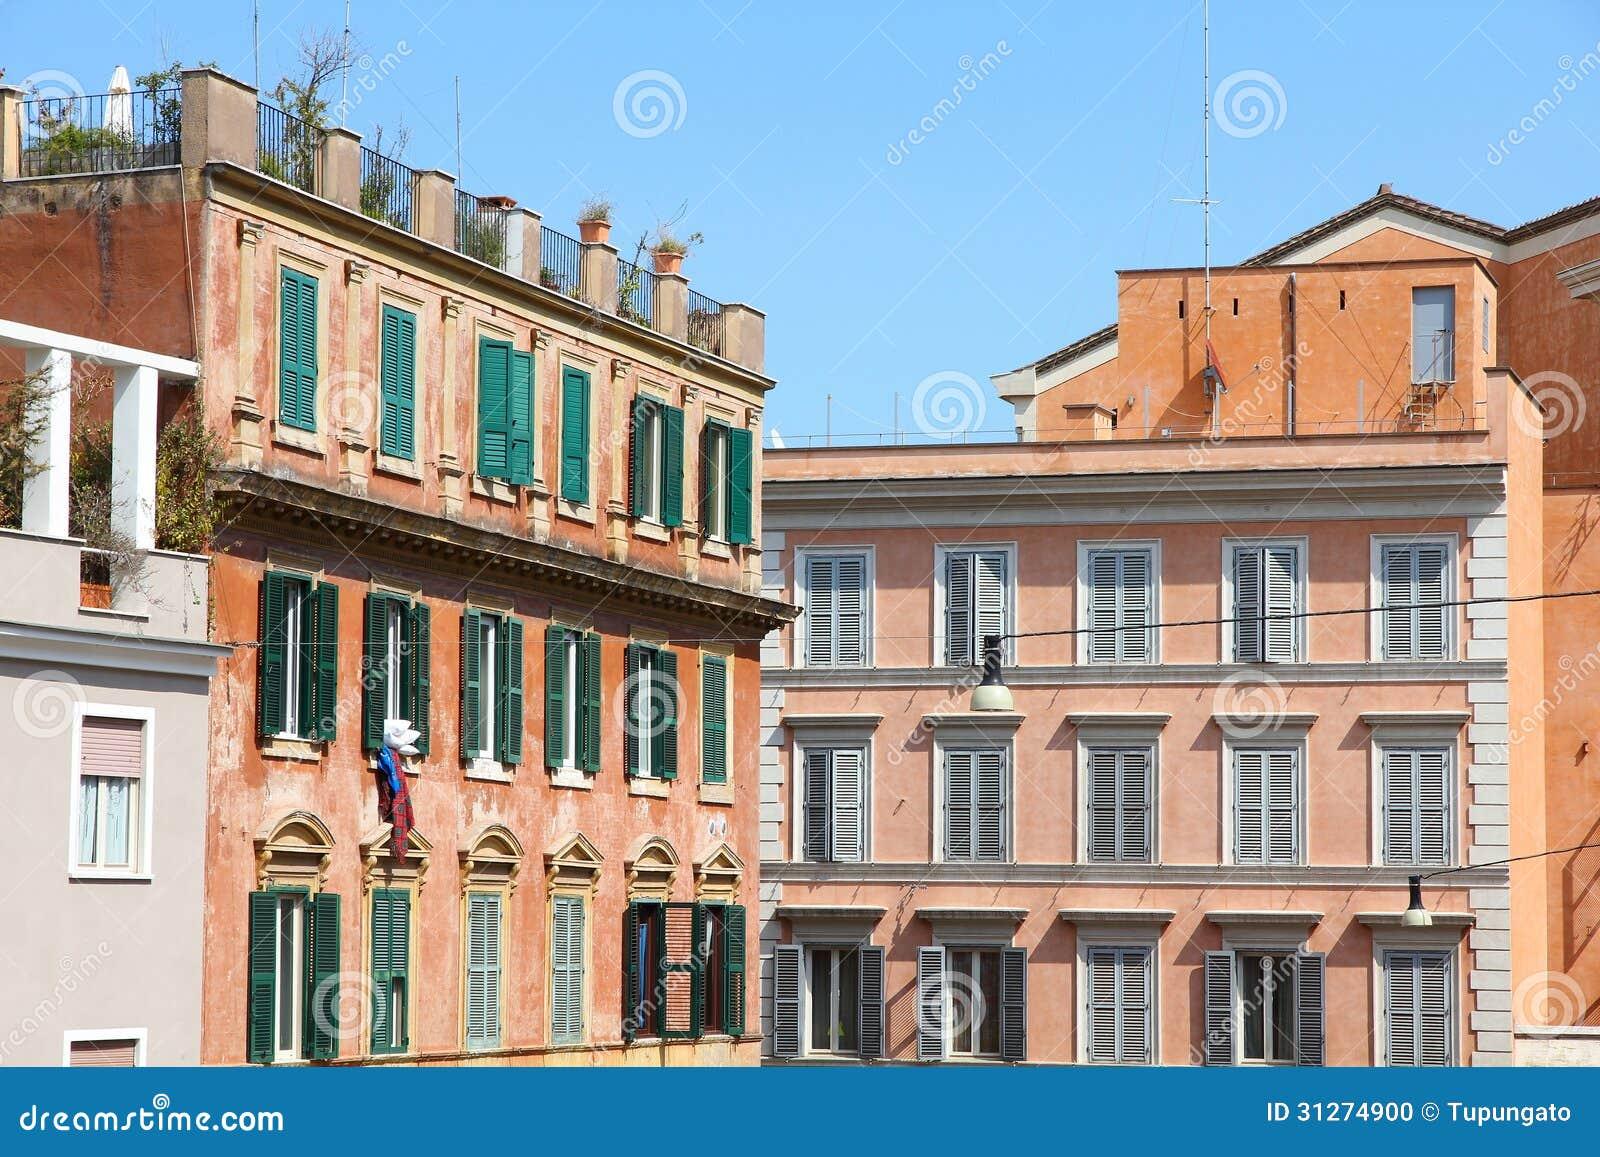 Italy Rome Stock Photo Image 31274900